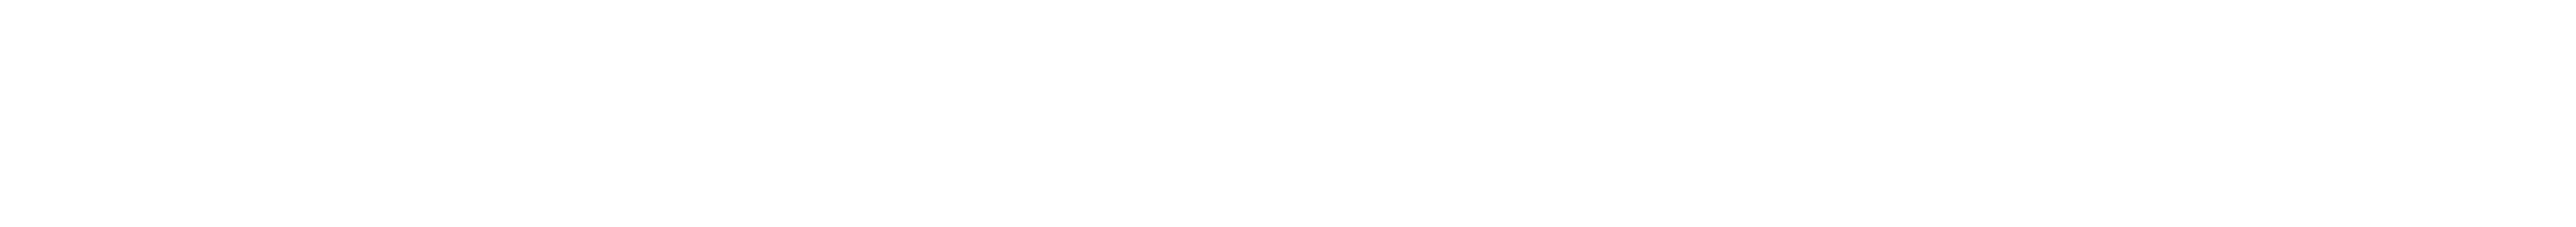 wit-boven-omlaag